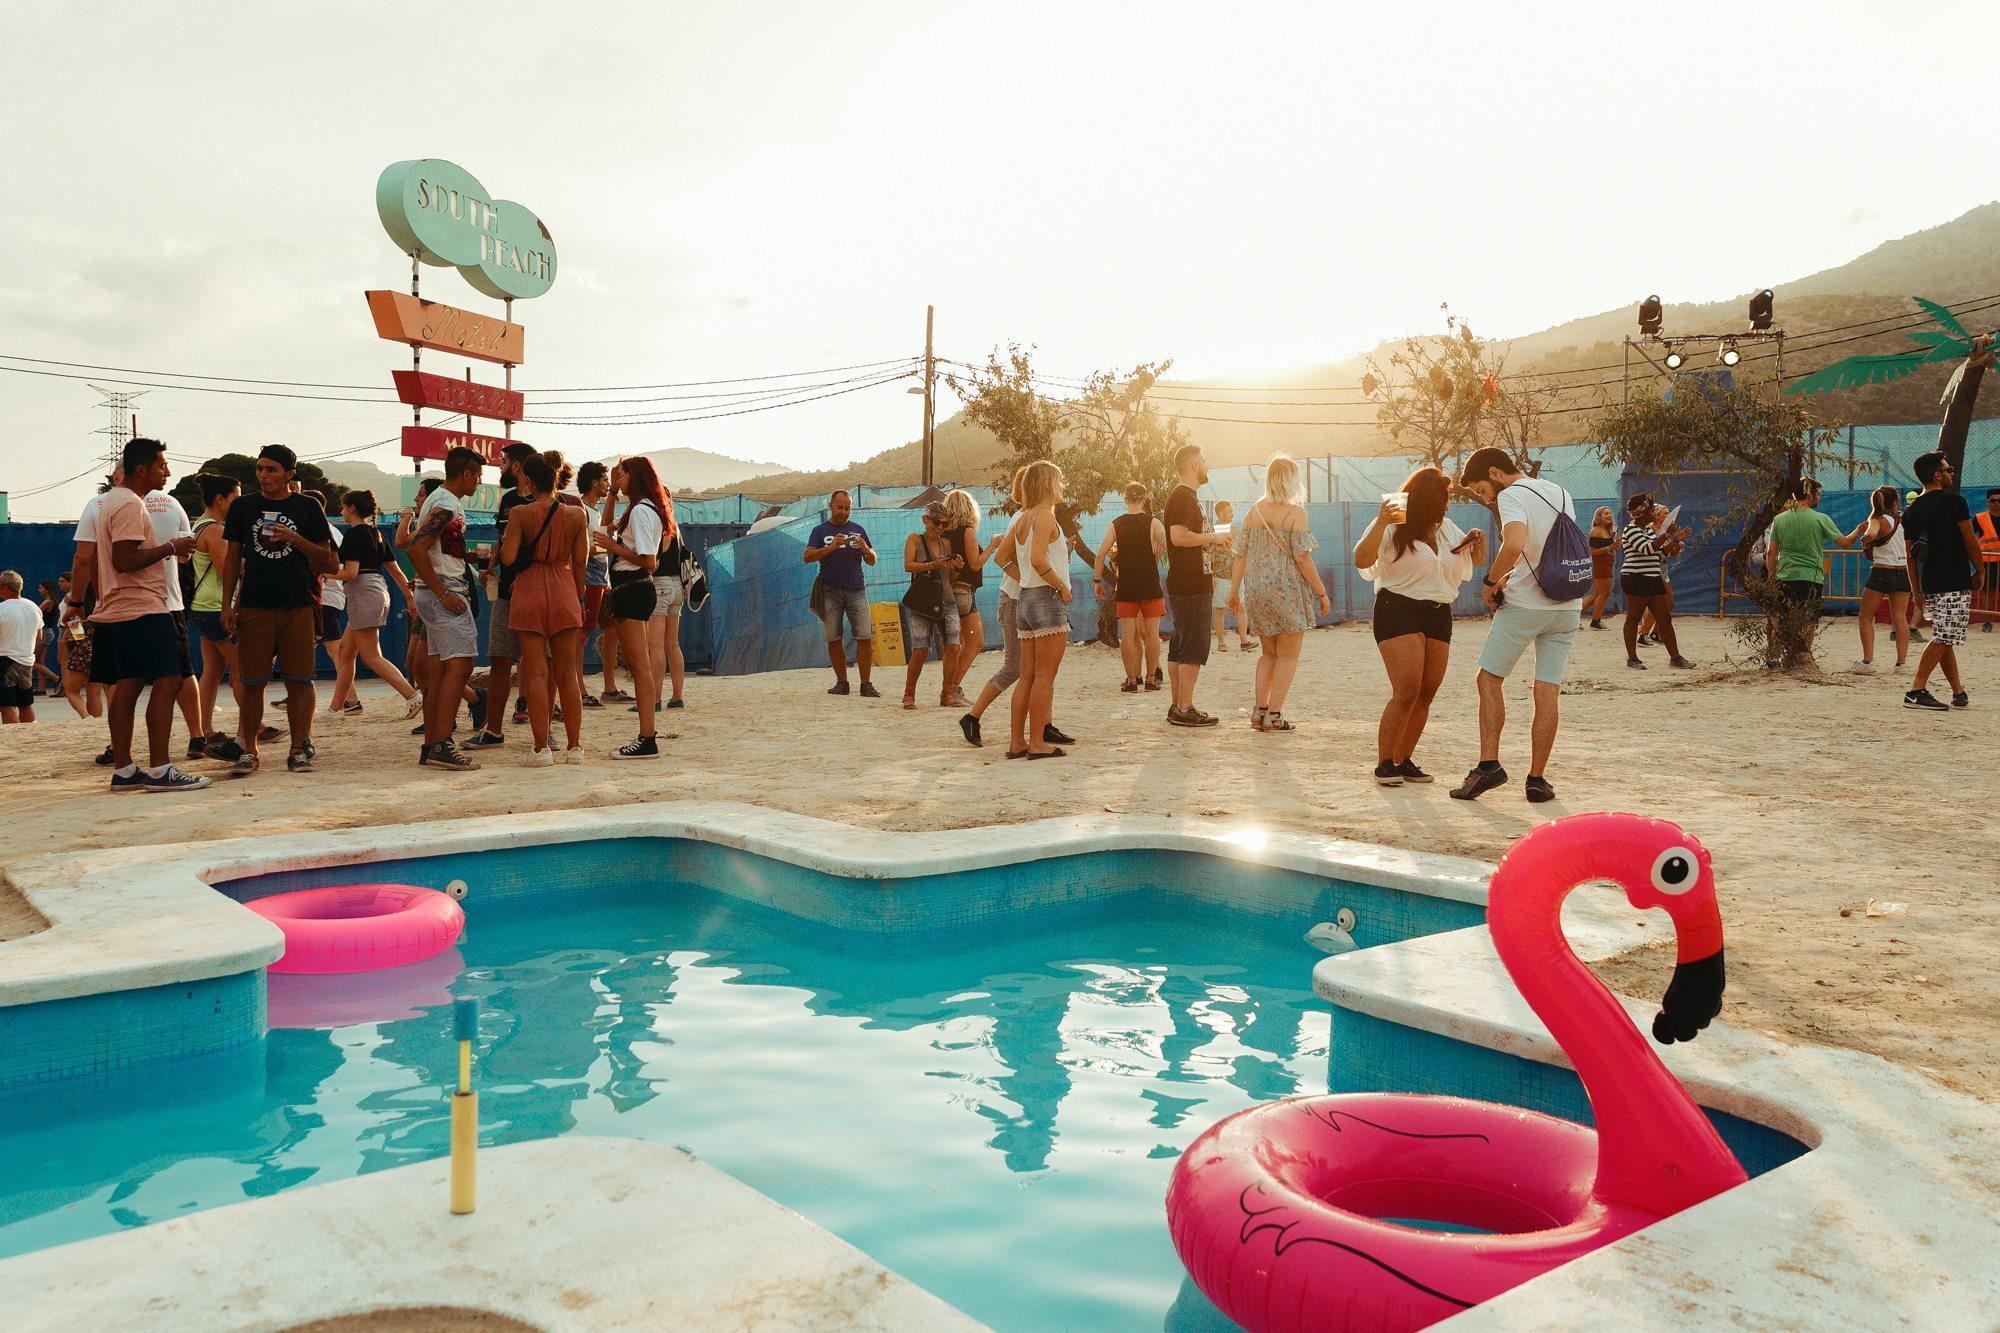 Benicassim Festival 2017 Highlights